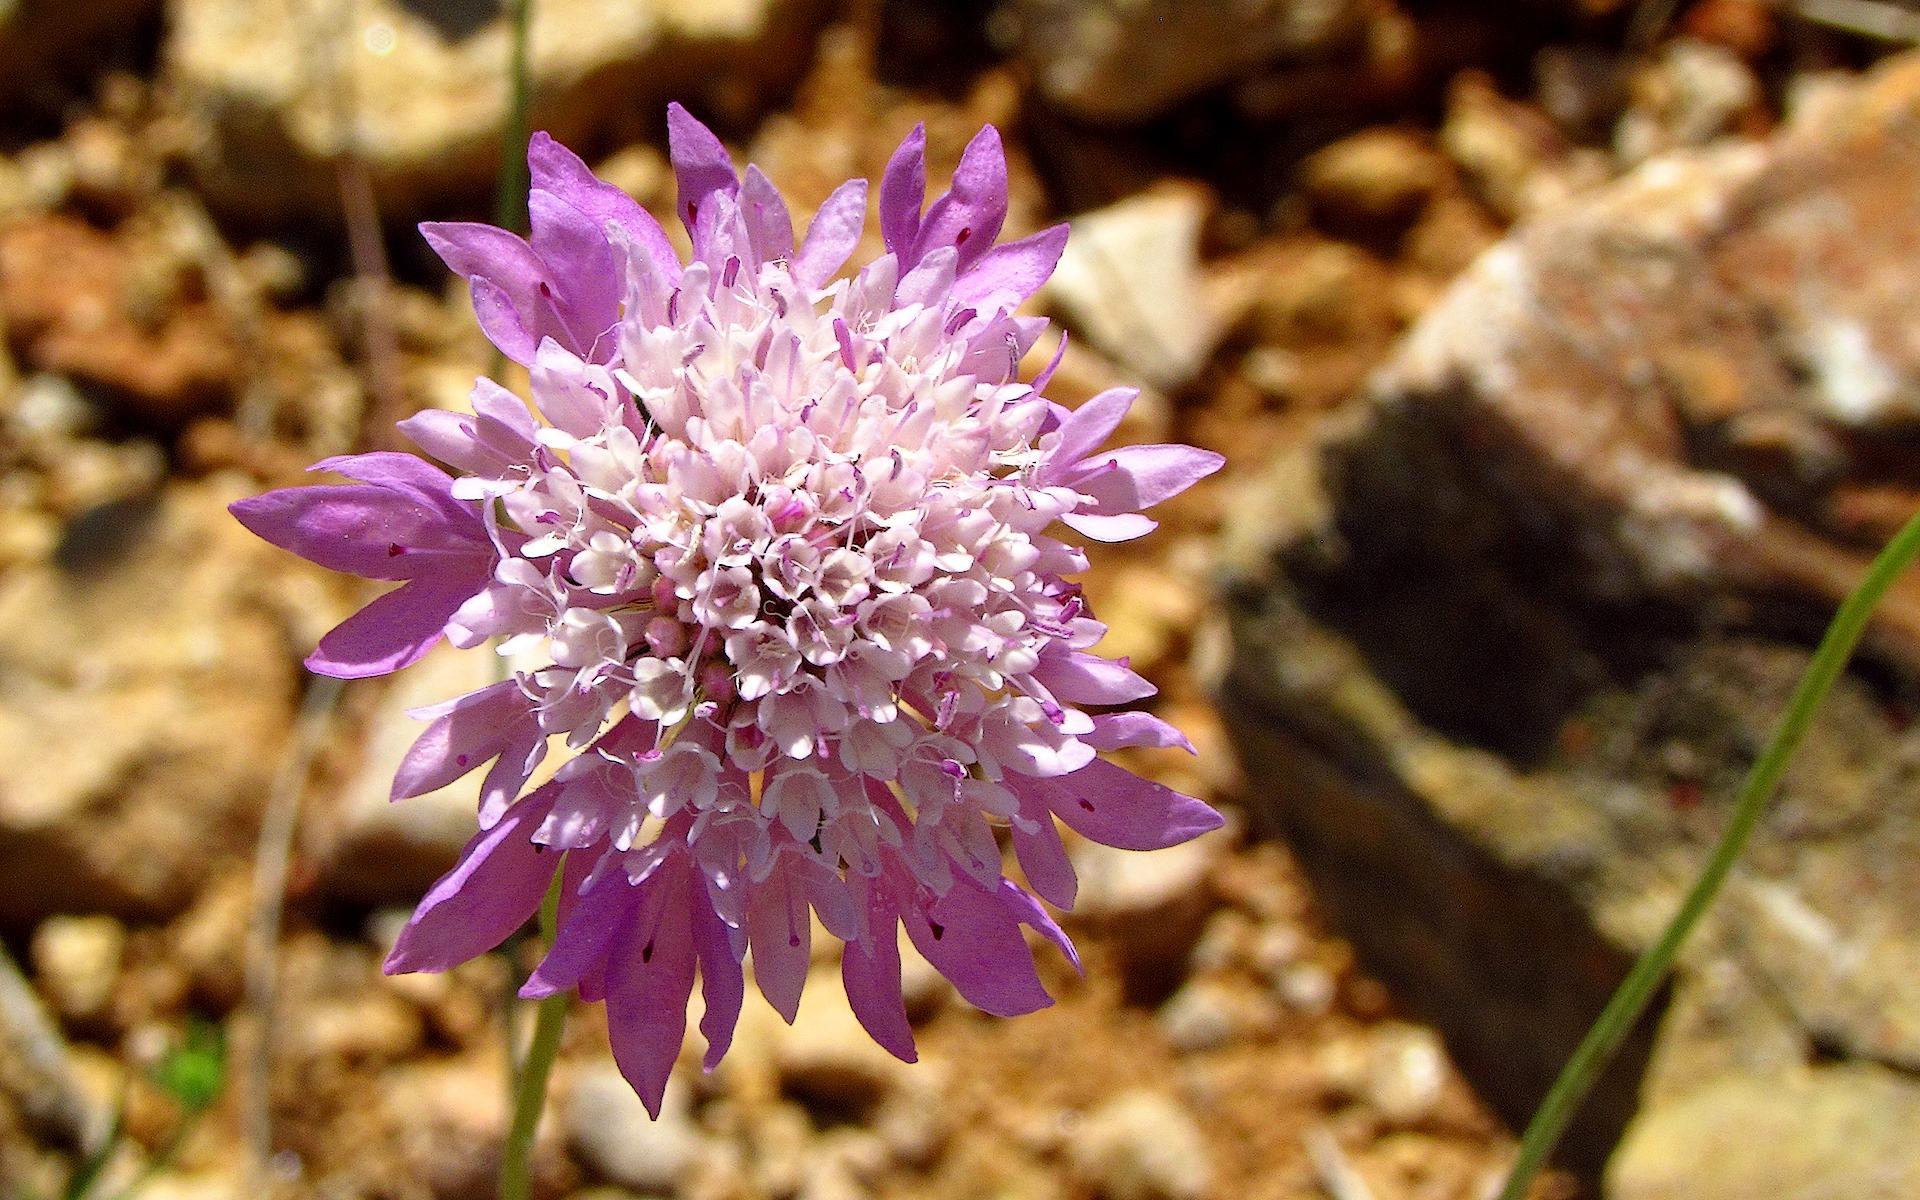 Flor en l'abeller. Autor, Jose Francisco Gasque Gas